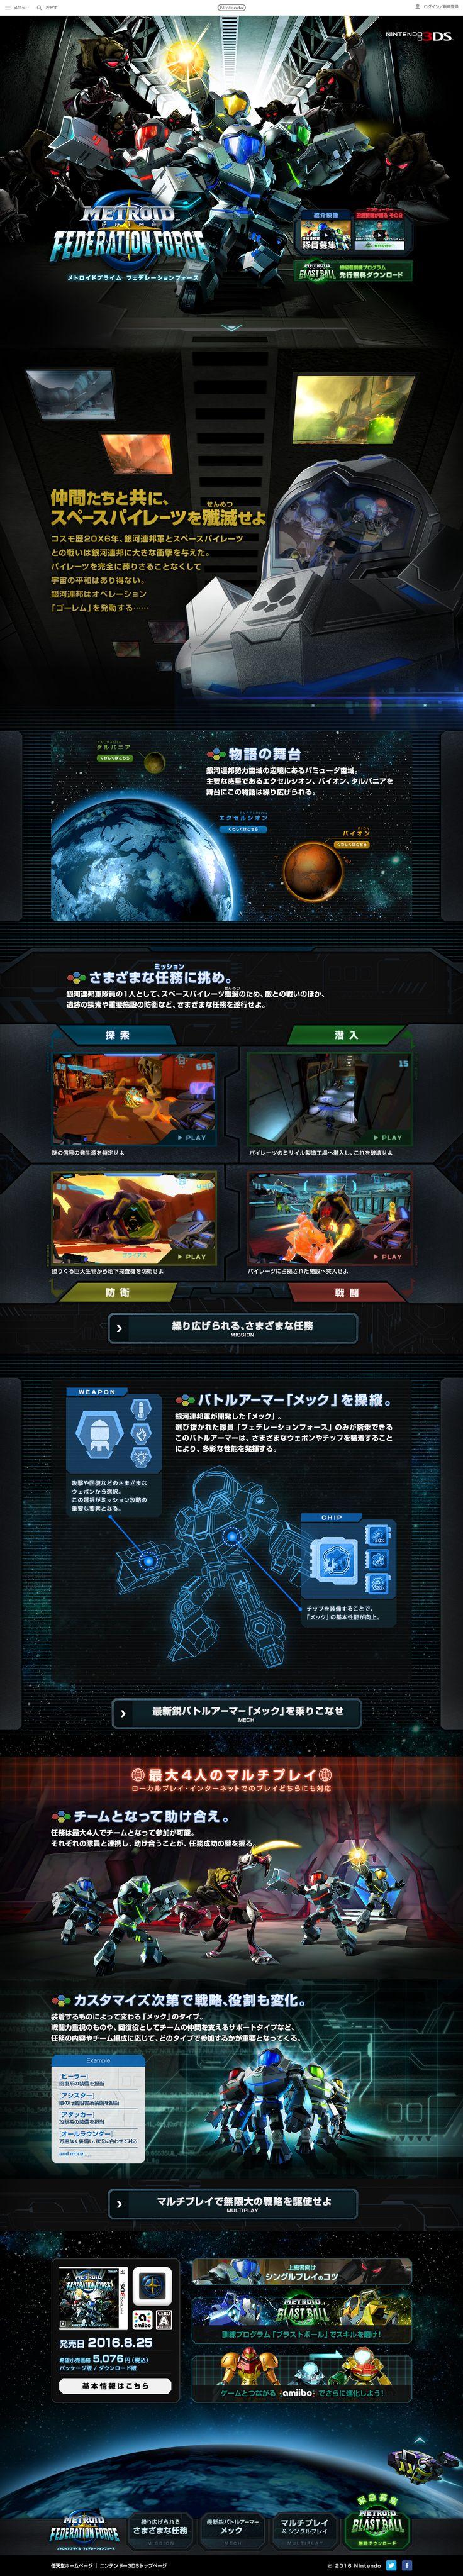 Metroid Prime federation force (Japanese) #WebDesign